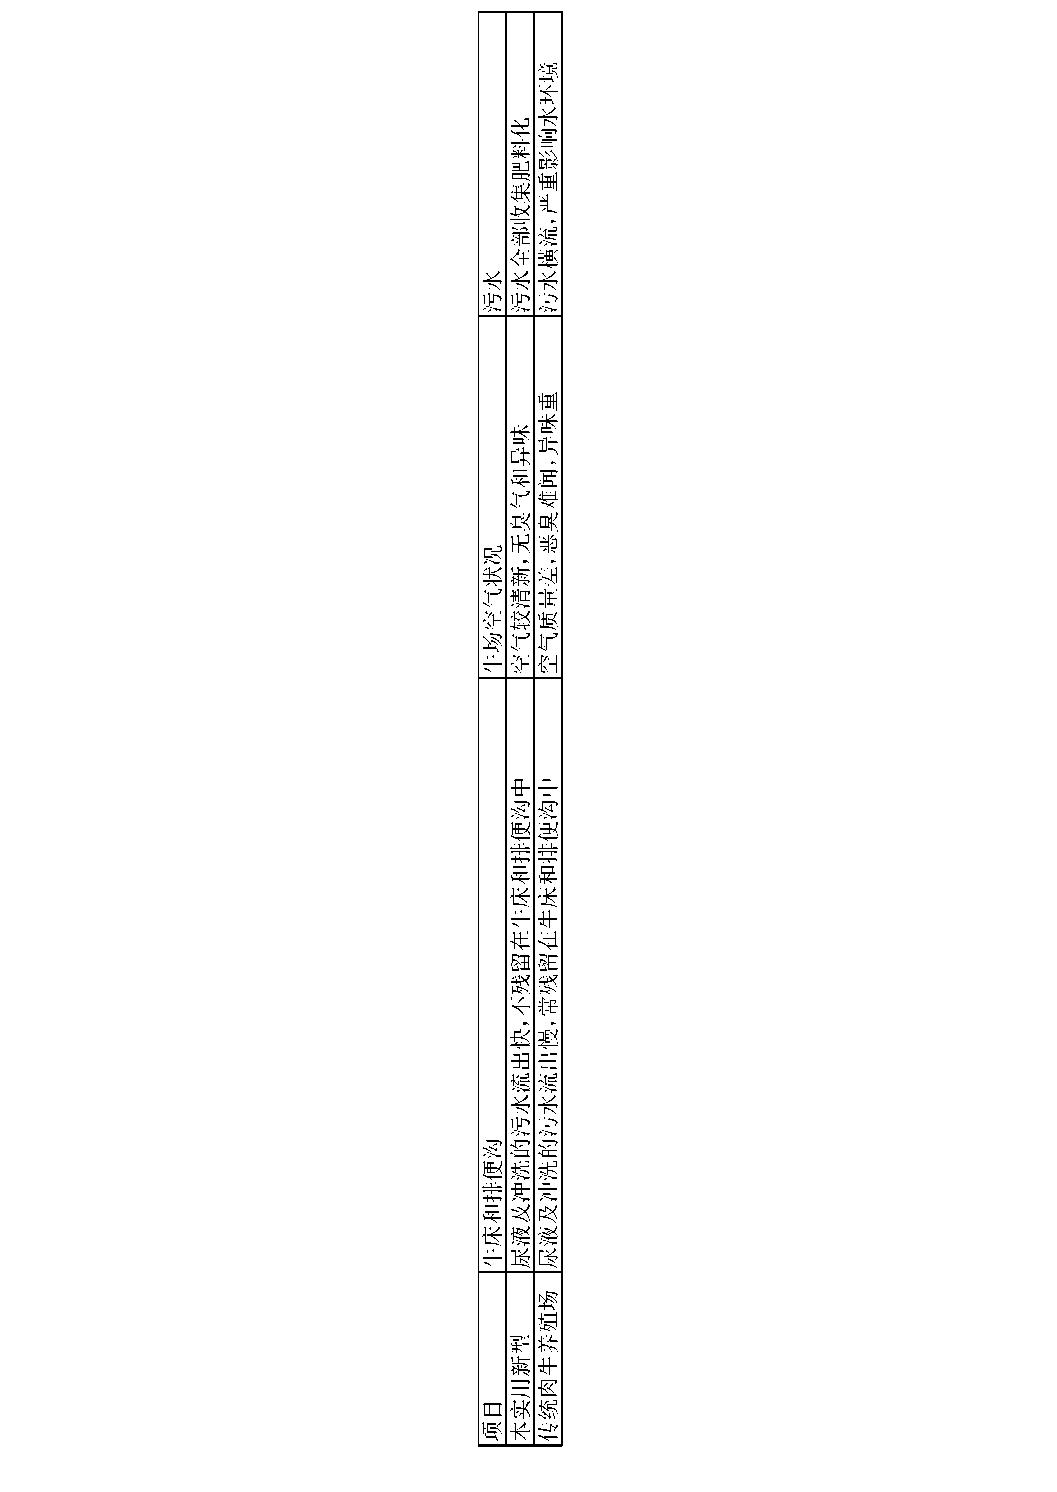 Figure CN204837452UD00071